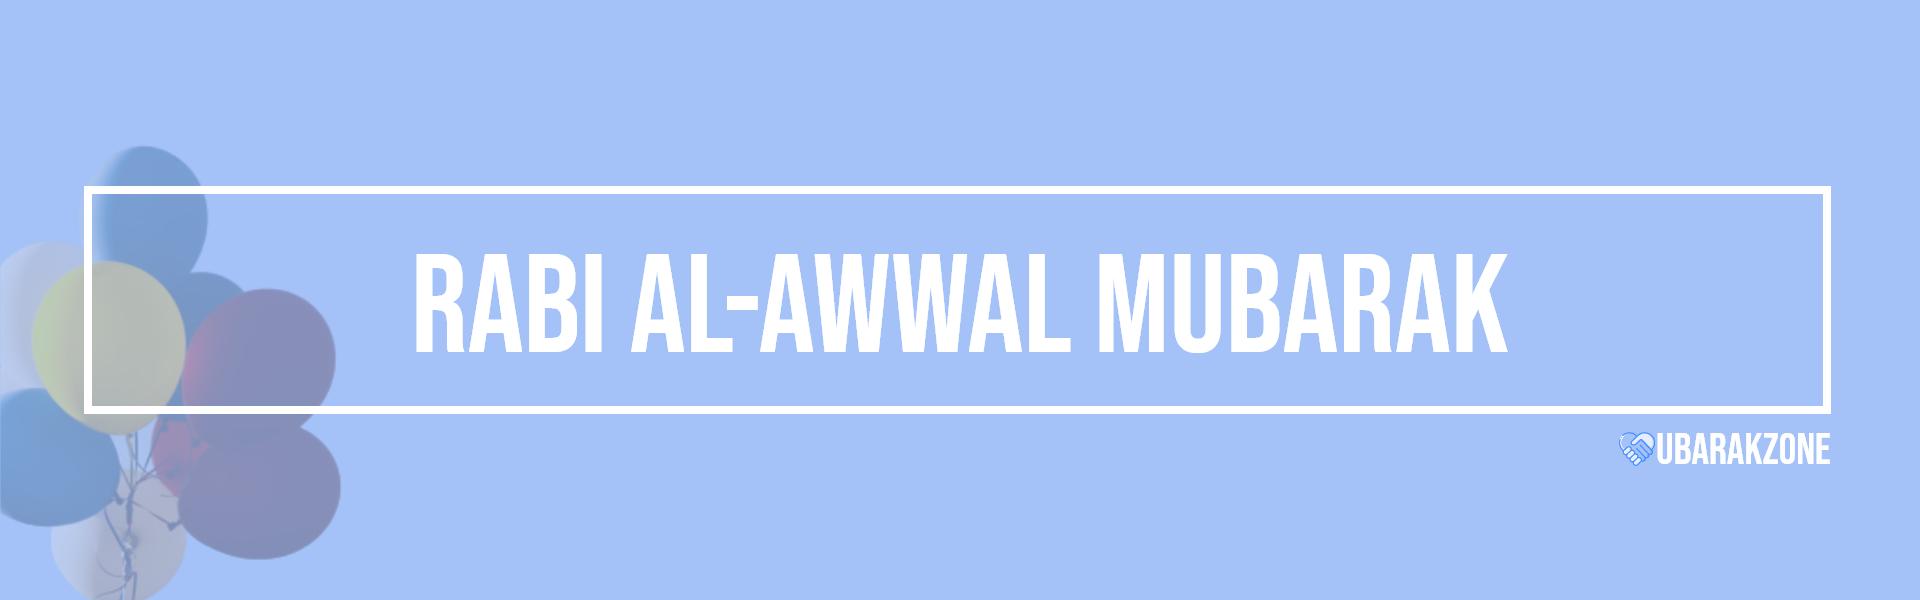 rabi al-awwal mubarak wishes messages